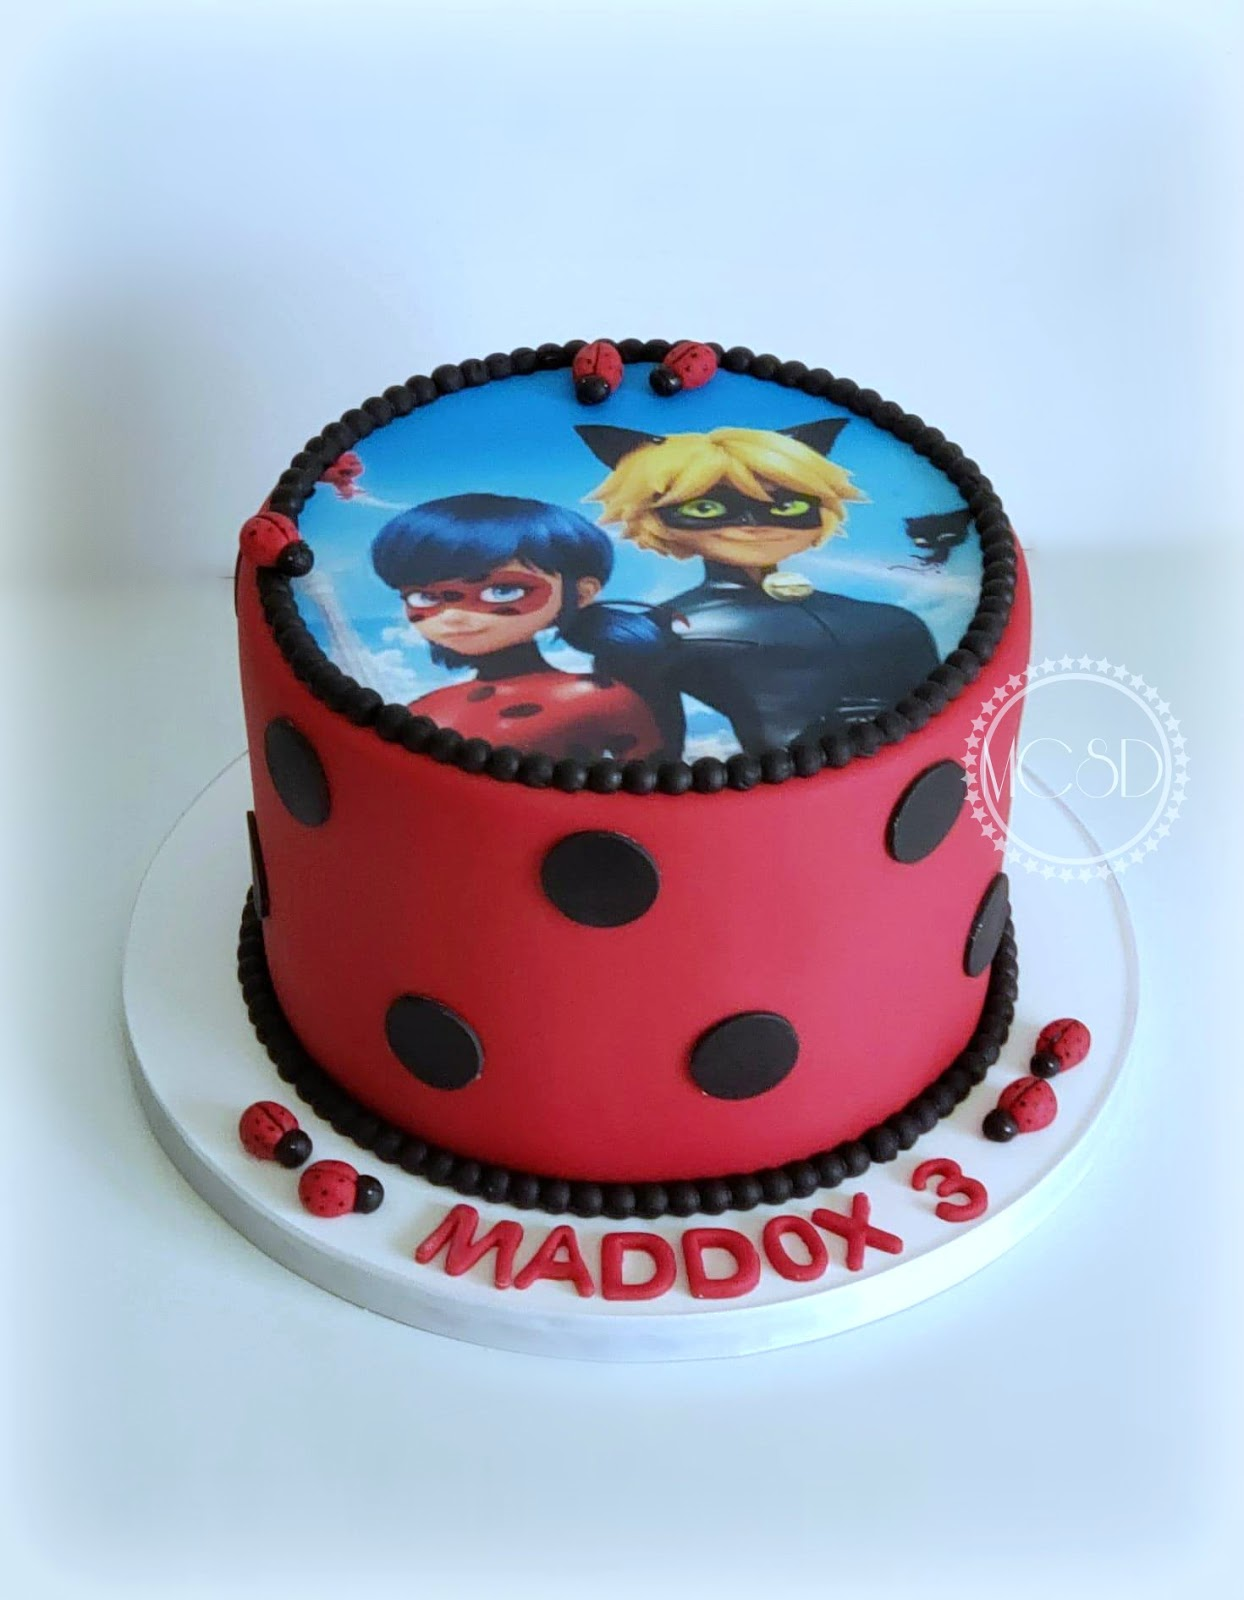 Miraculous Cakesbyzana Miraculous Ladybug Cake Funny Birthday Cards Online Elaedamsfinfo